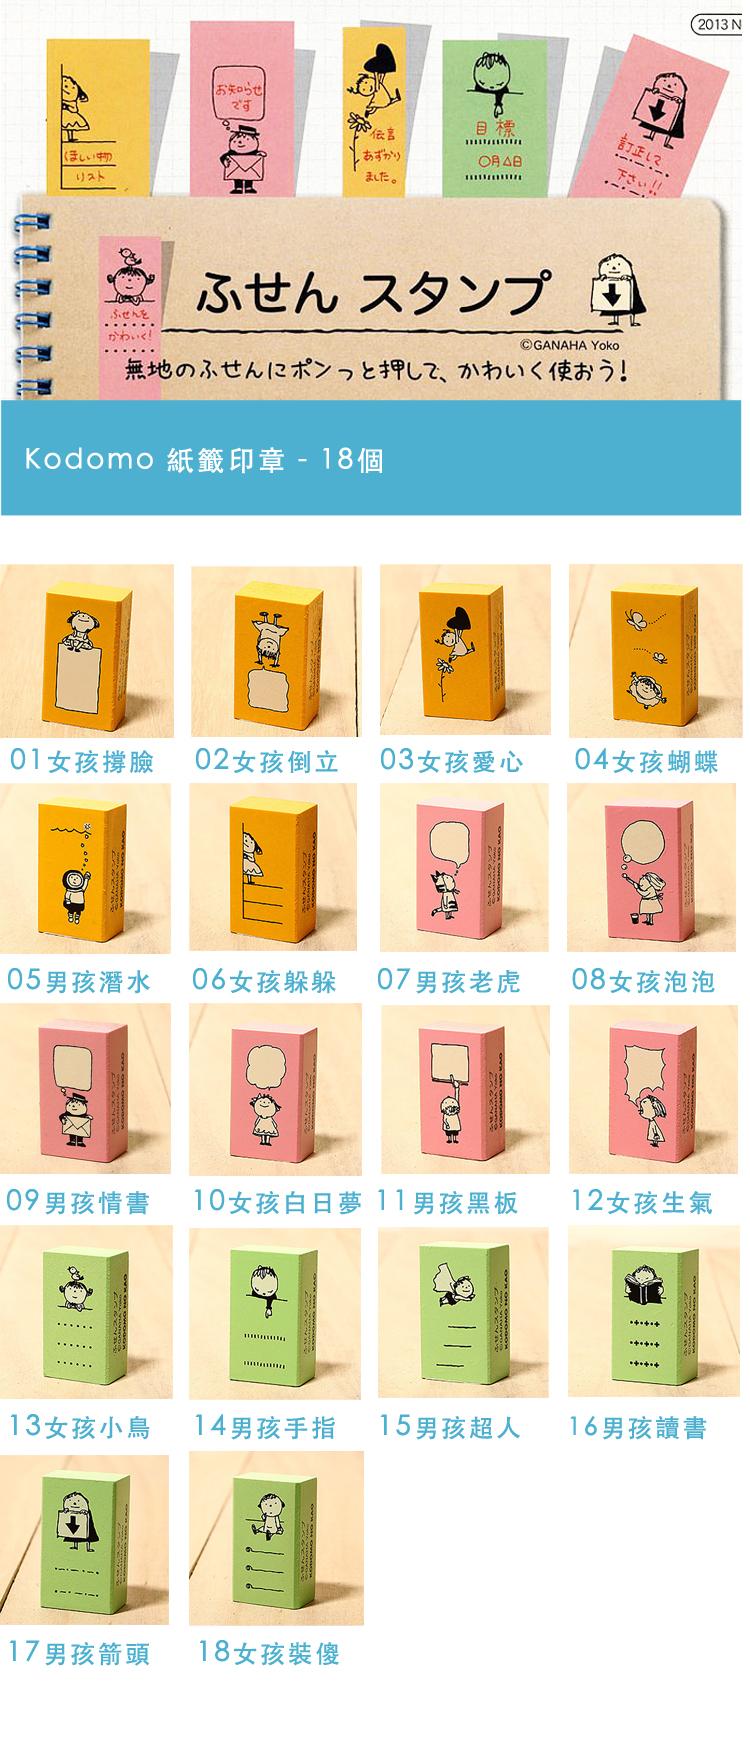 Kodomo 小孩牌 紙籤 印章 款式表